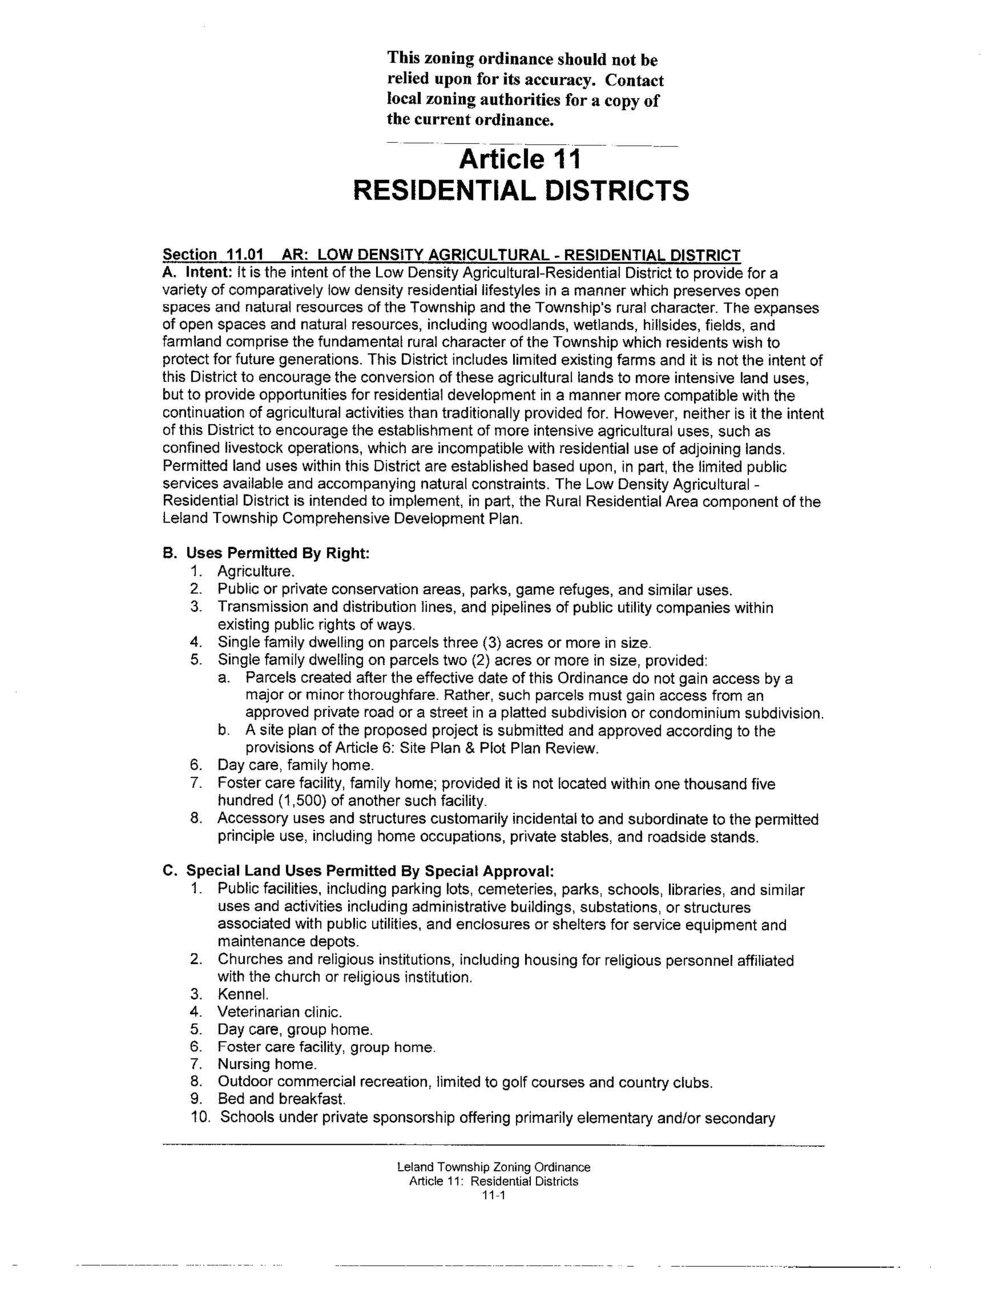 564 S Woodsmoke Drive, Lake Leelanau, MI – Sunset Lake Michigan Water Views - For Sale by Oltersdorf Realty - Marketing Packet (40).jpg